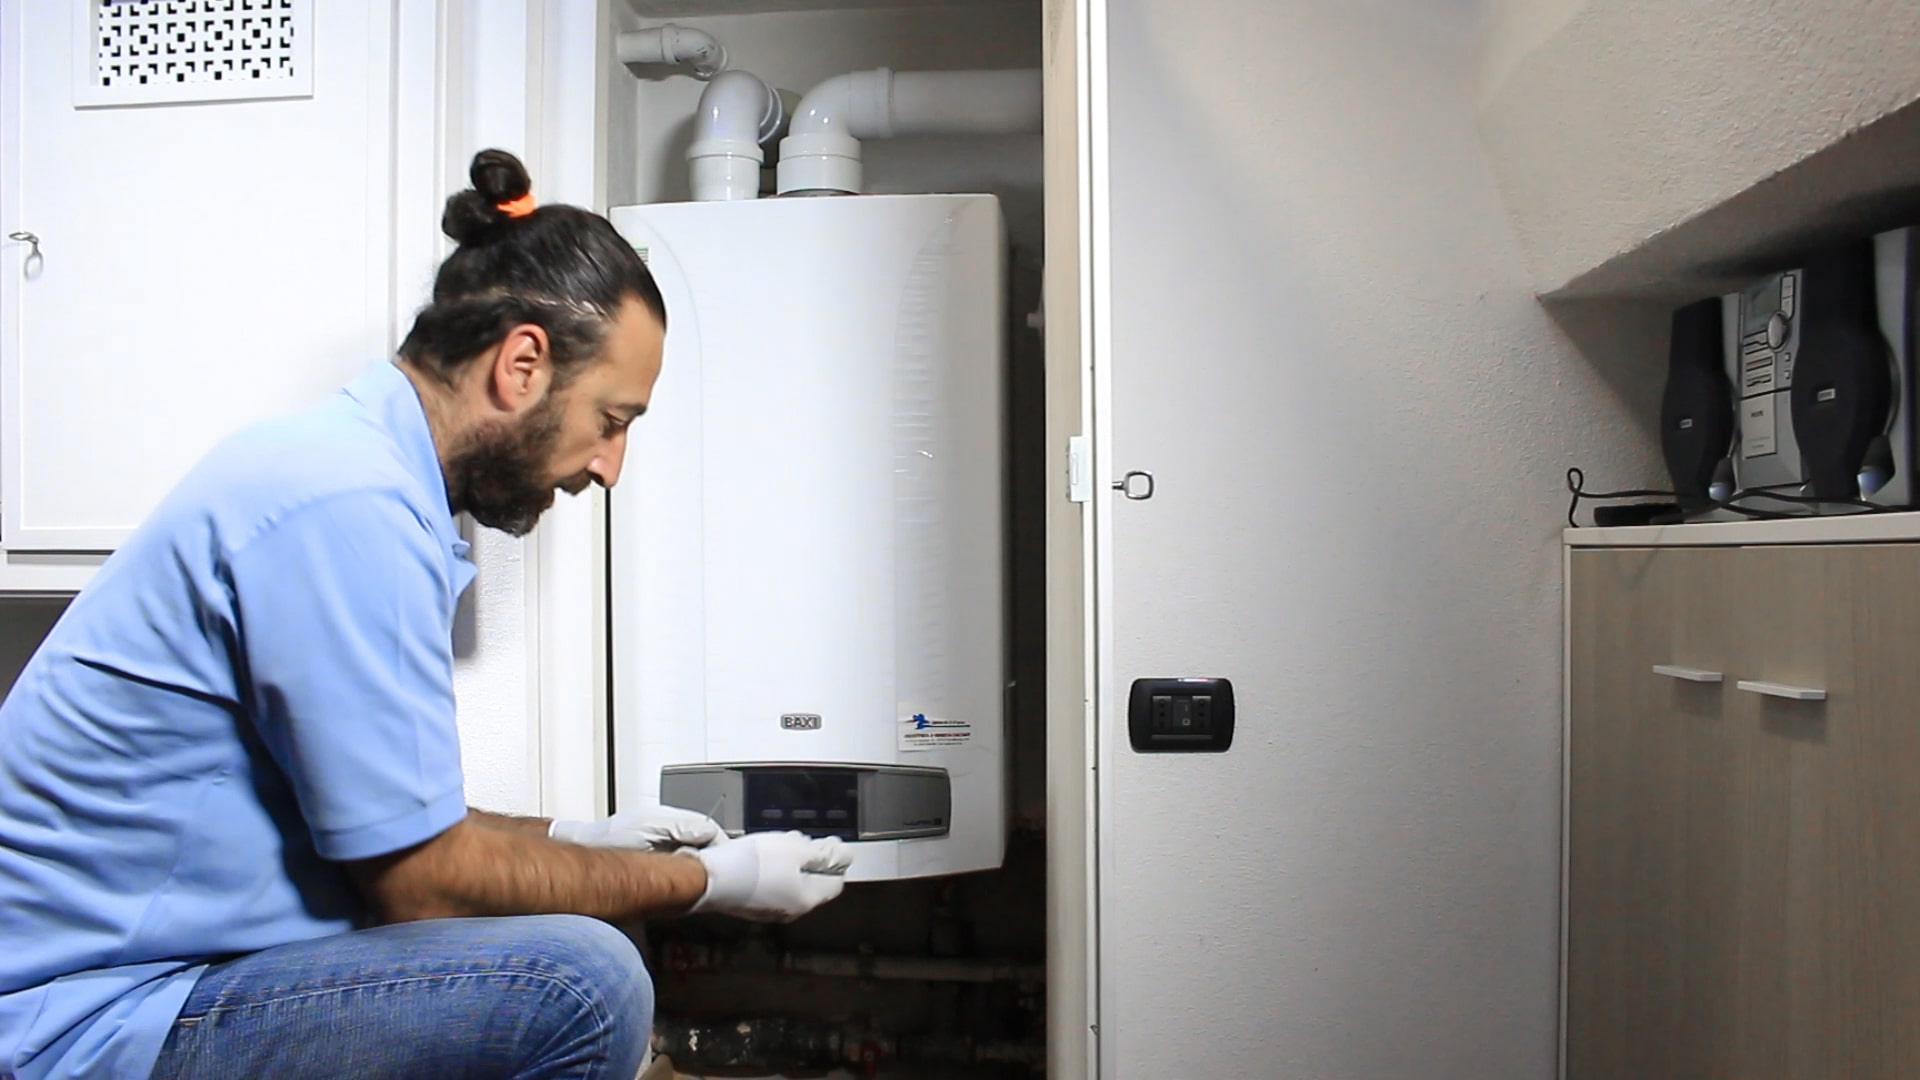 Caldaia A Condensazione Svantaggi caldaia esterna o interna? guida alla scelta | modo d